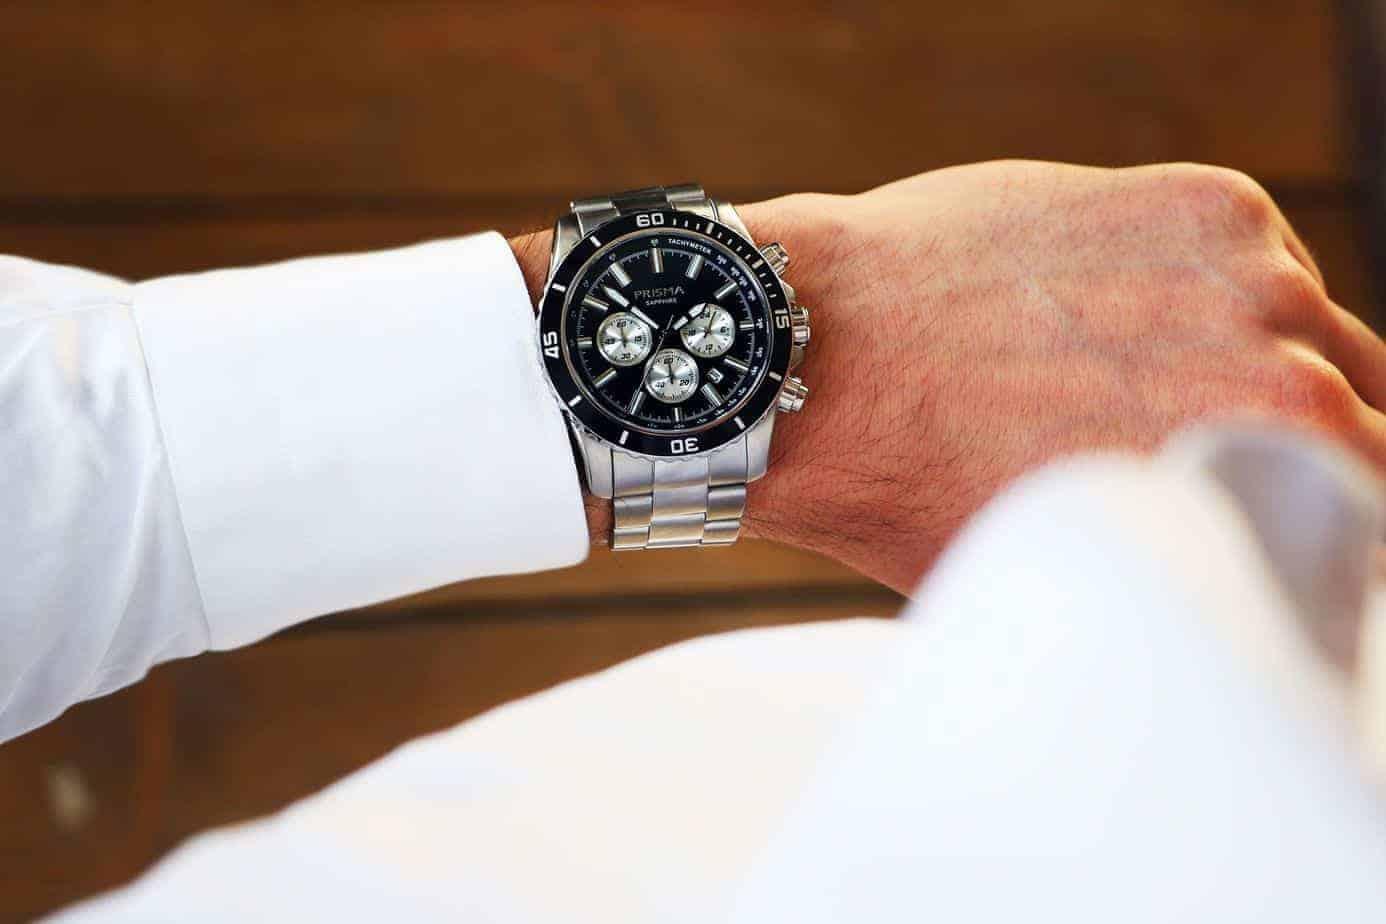 prisma explorer navigator blue prisma watches horloges